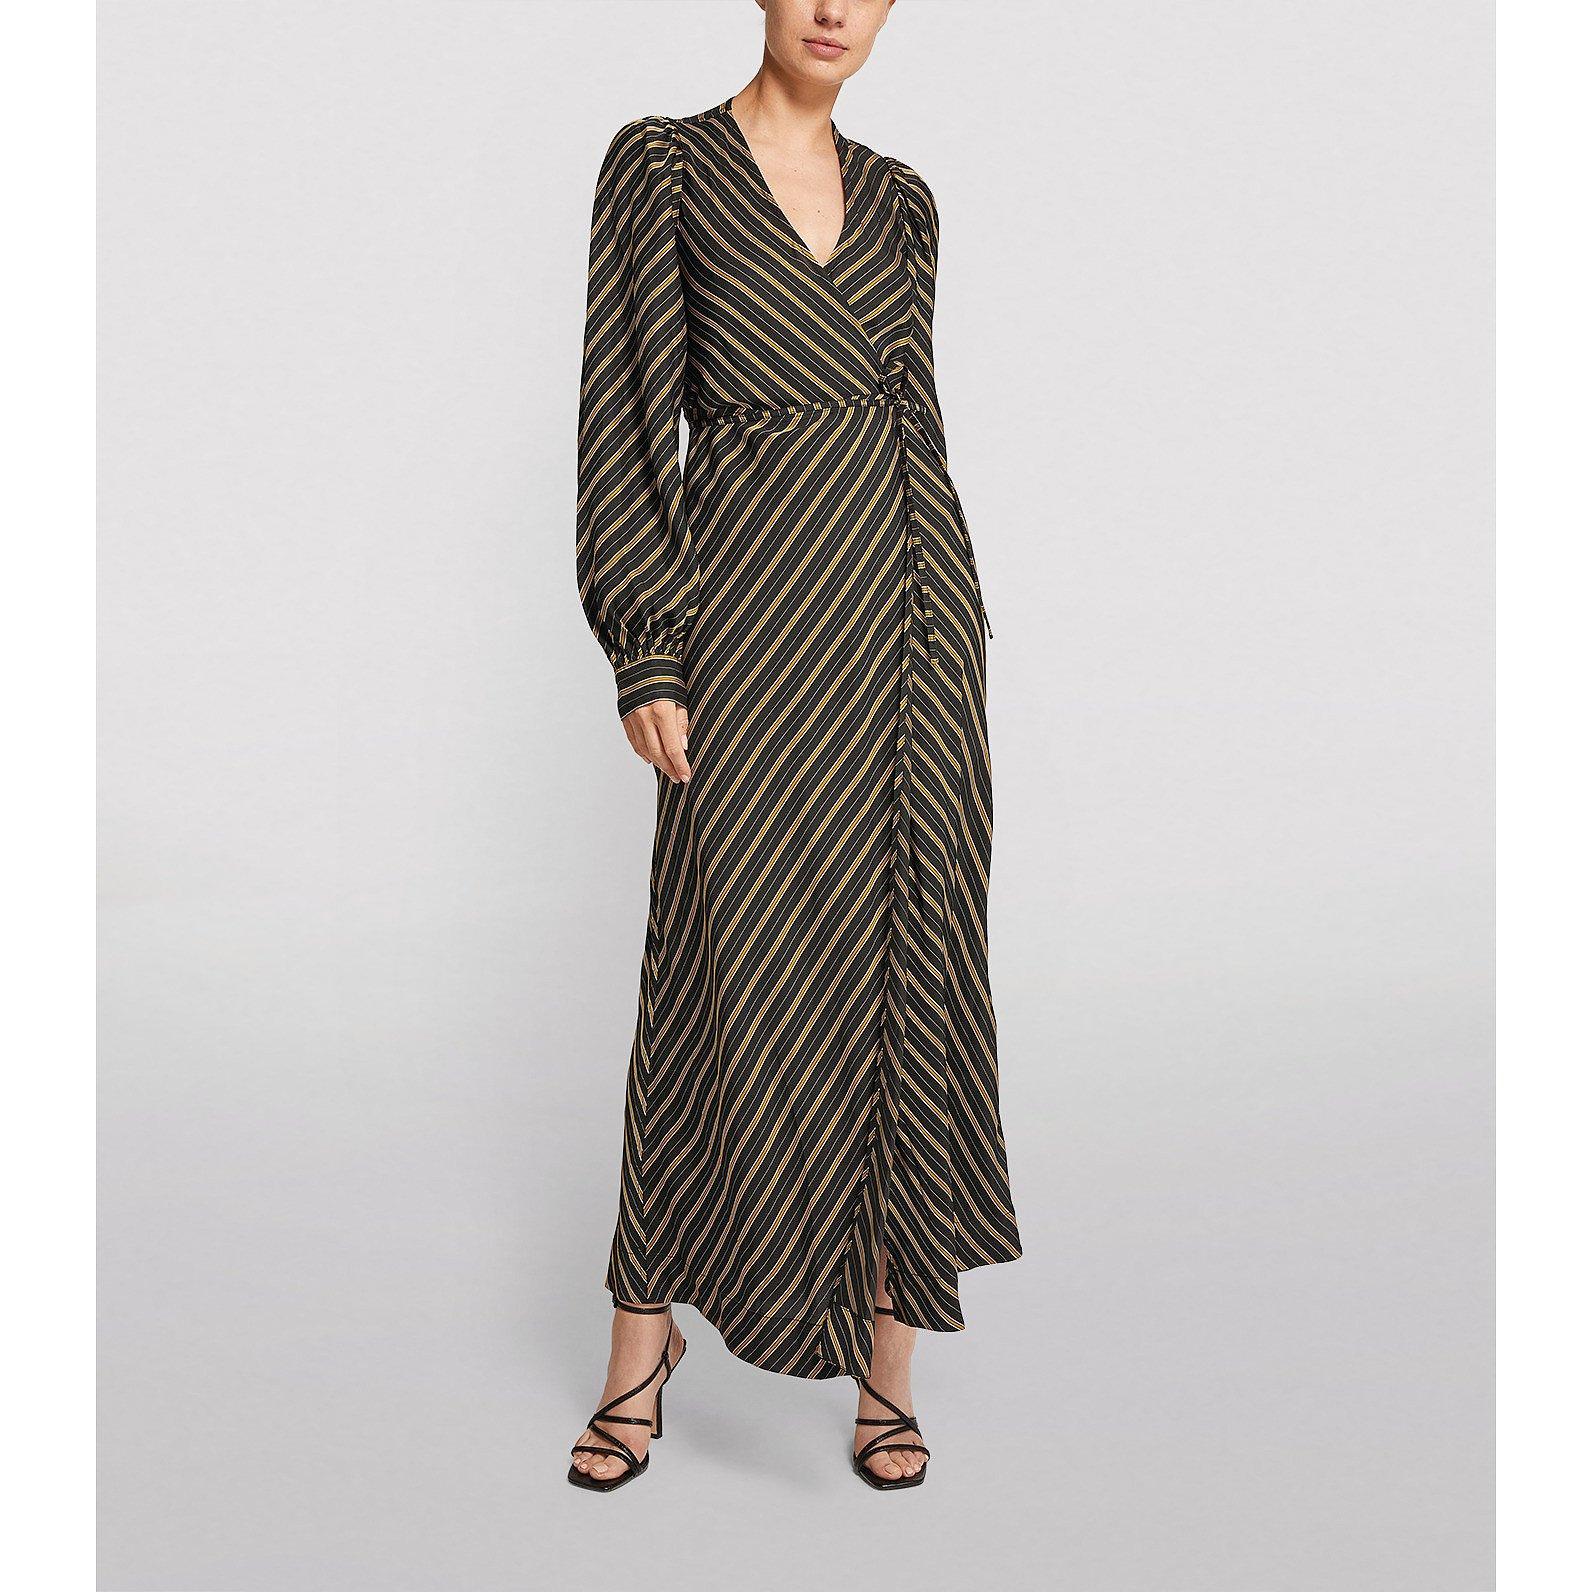 Ganni Stripe Print Wrap Dress